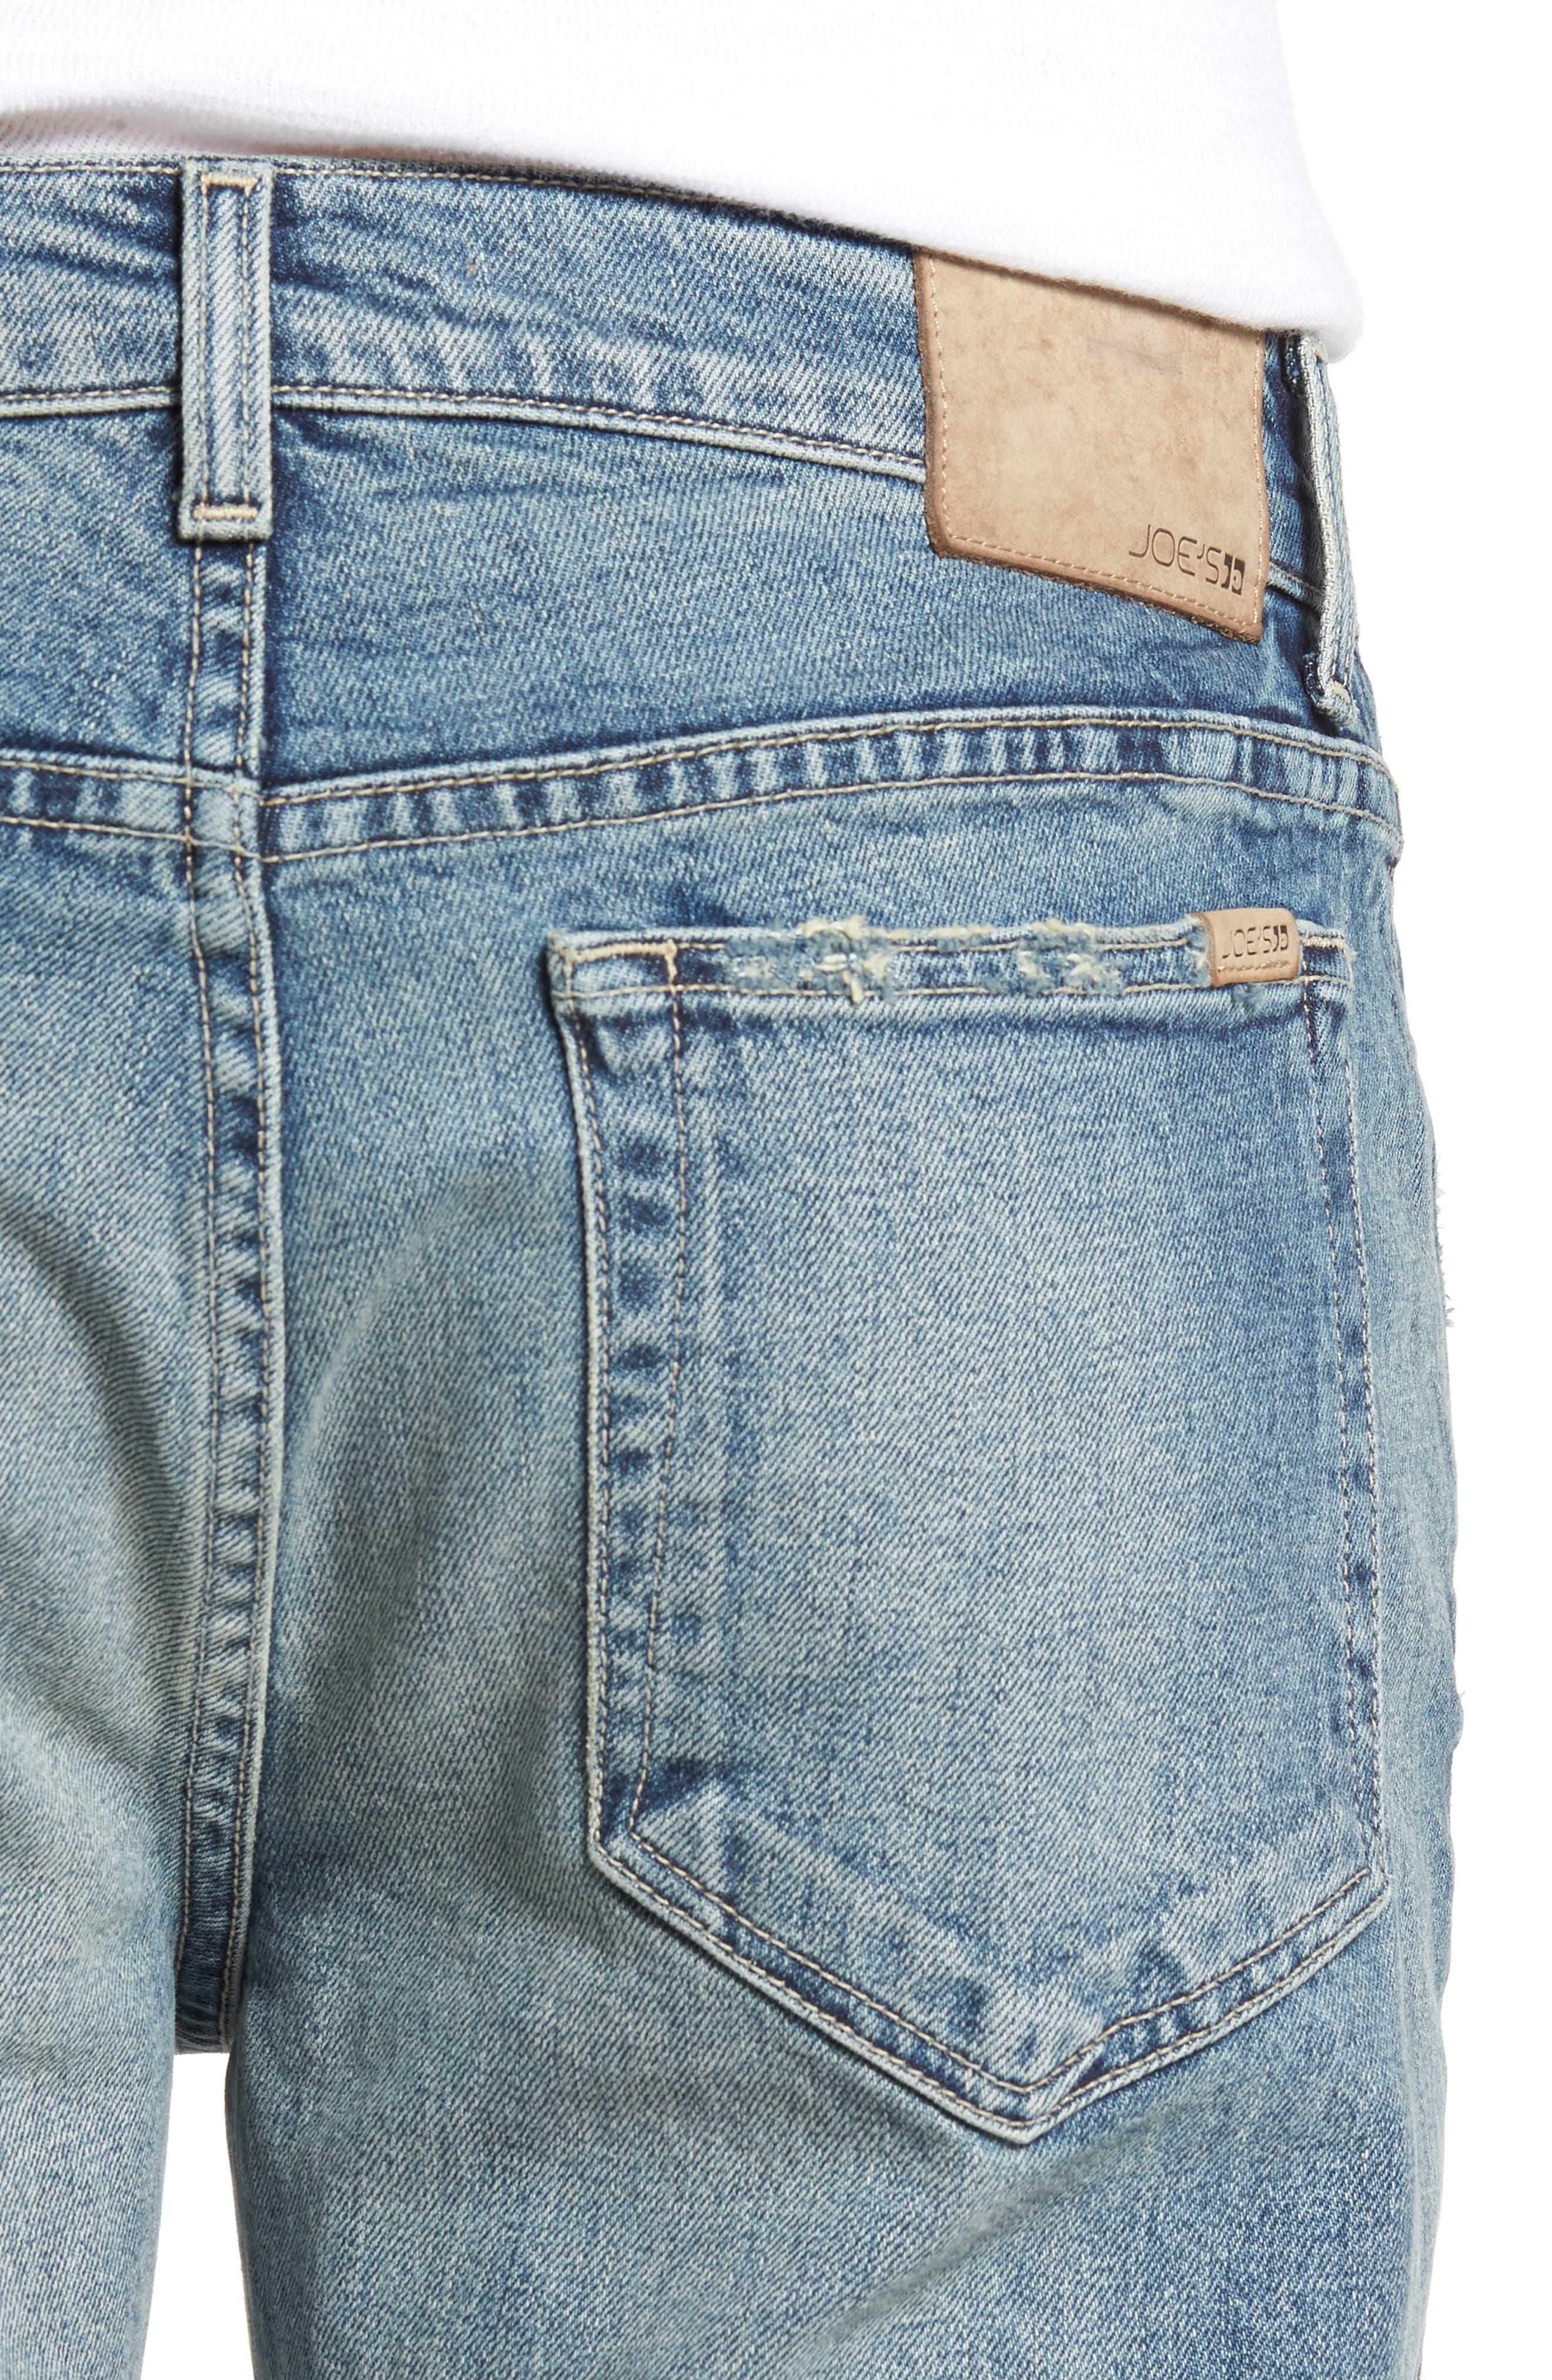 Brixton Slim Straight Fit Jeans,                             Alternate thumbnail 4, color,                             Harken